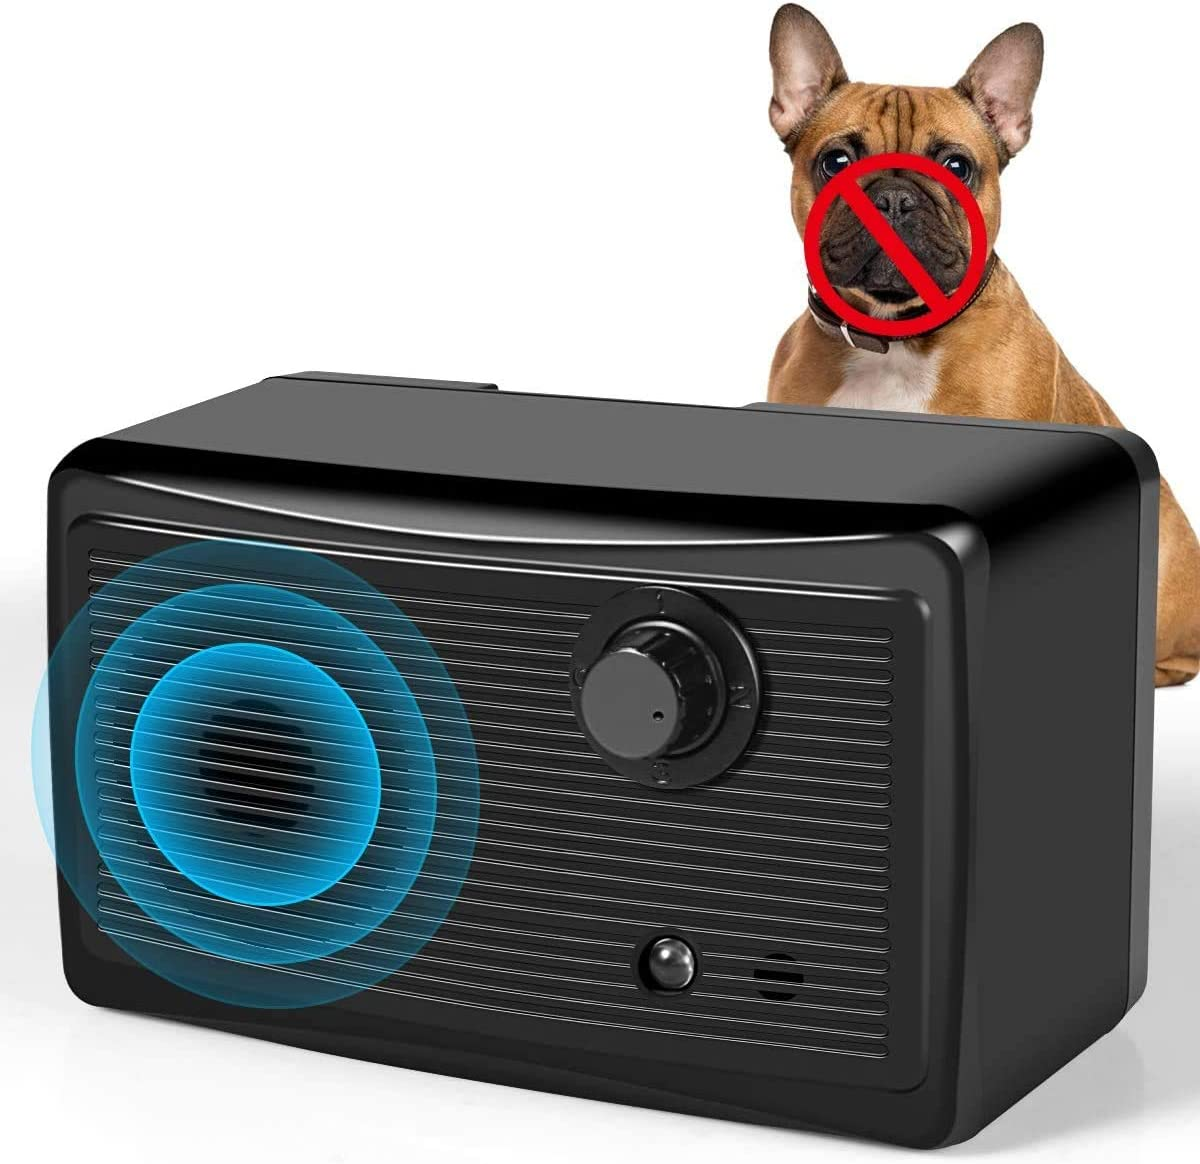 Upgraded Mini Sonic Bark Deterrents 3 Ultrasonic Frequency 30Khz 50 Ft Range Anti Bark Training Tool Barking Control Device